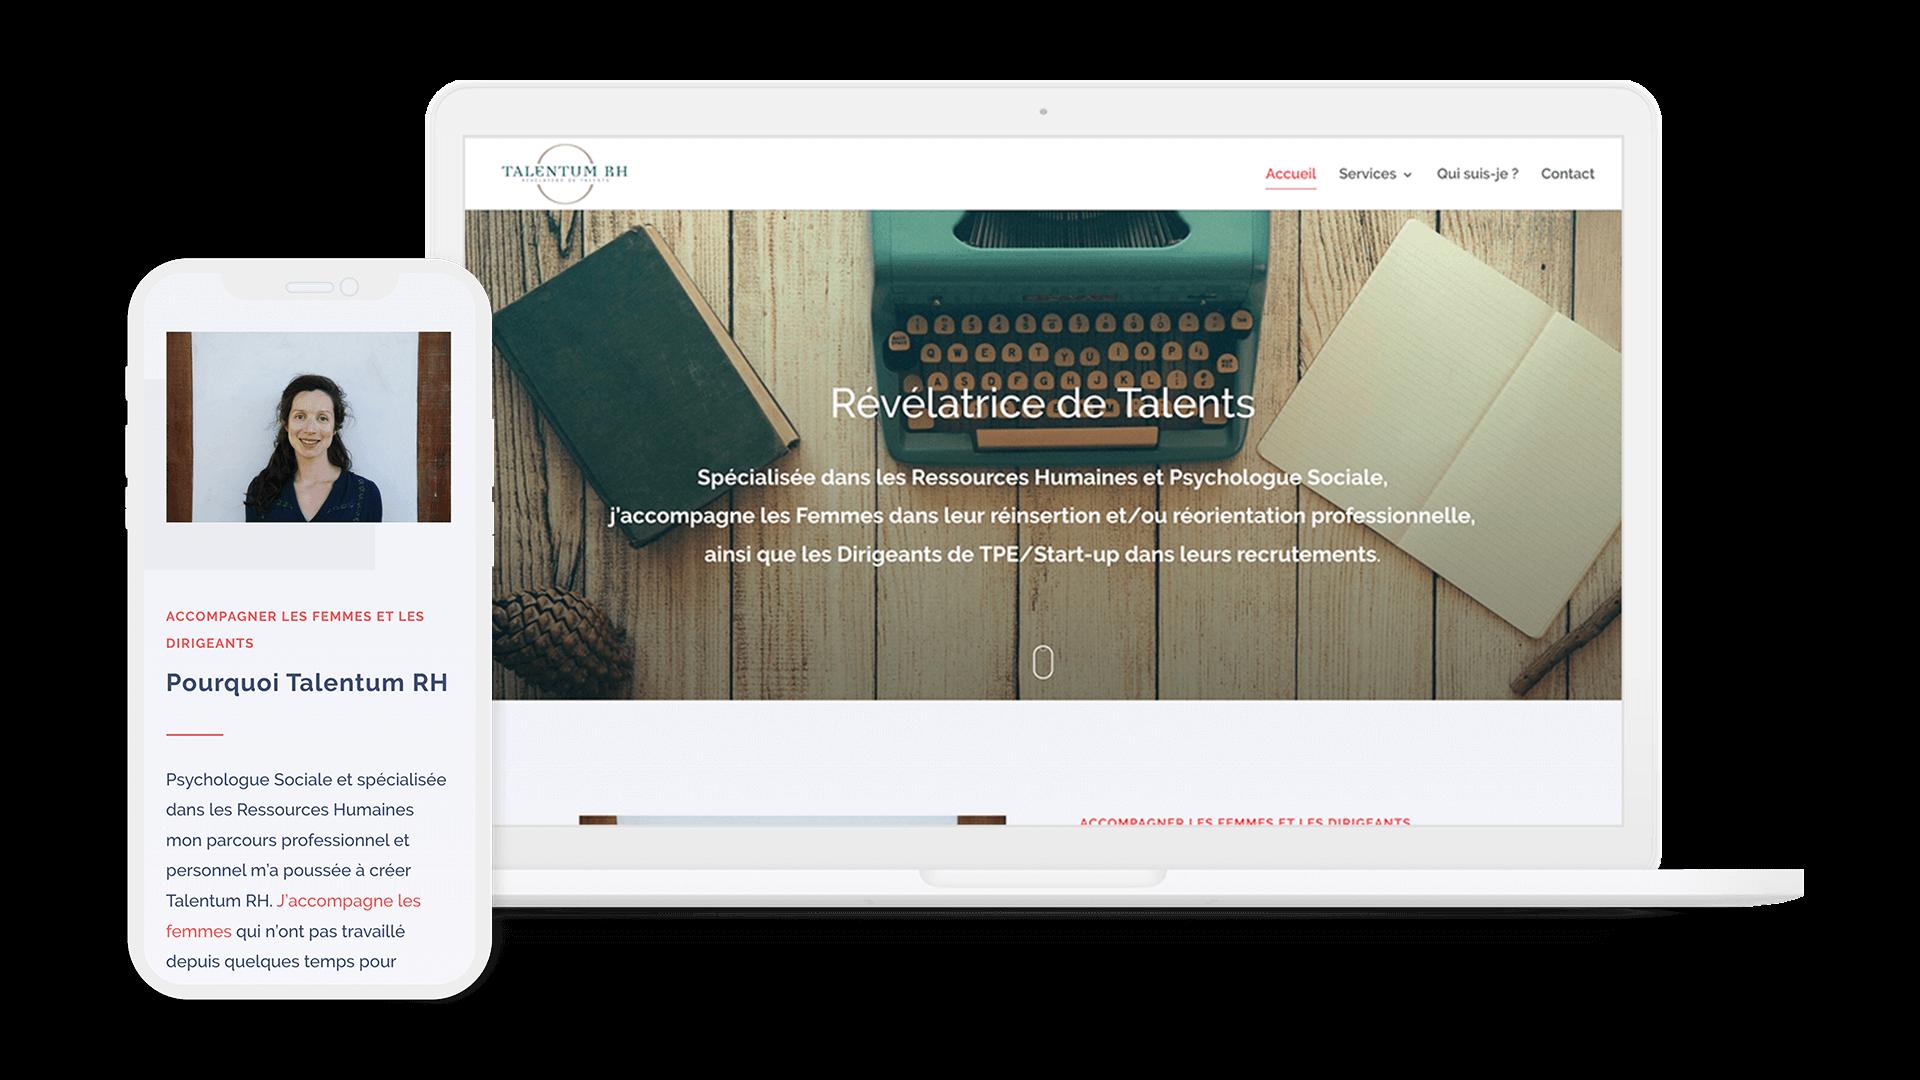 talentum - Web at Heart, agence digitale à Lyon